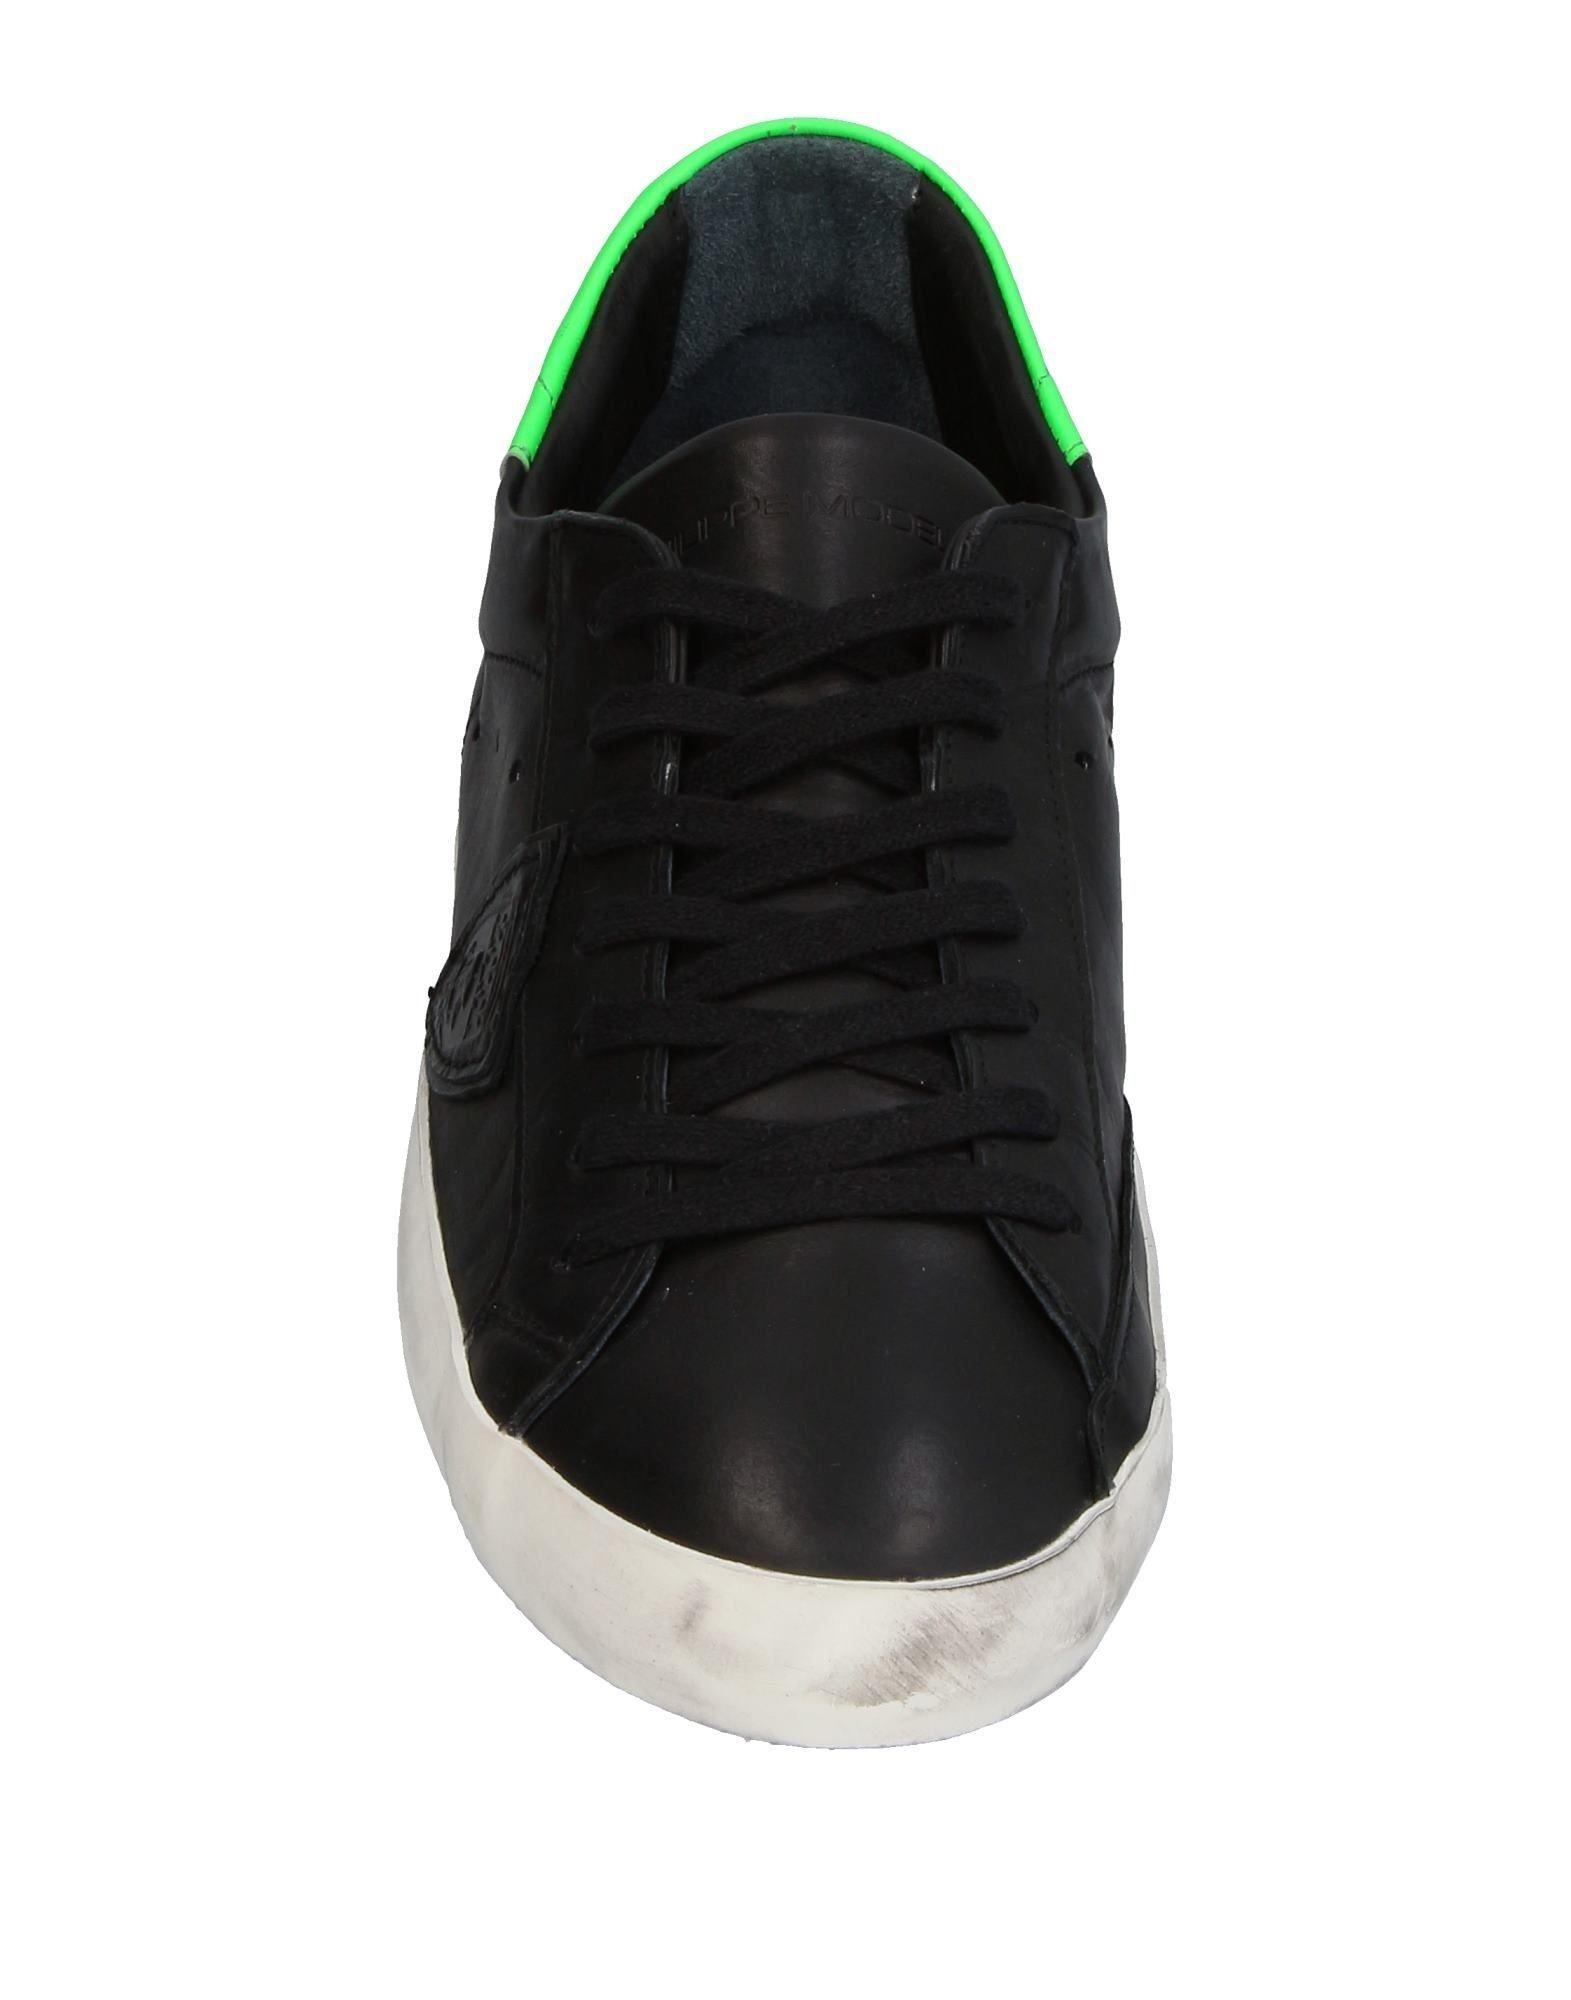 Philippe 11379738BN Model Sneakers Herren  11379738BN Philippe Gute Qualität beliebte Schuhe 1acb34